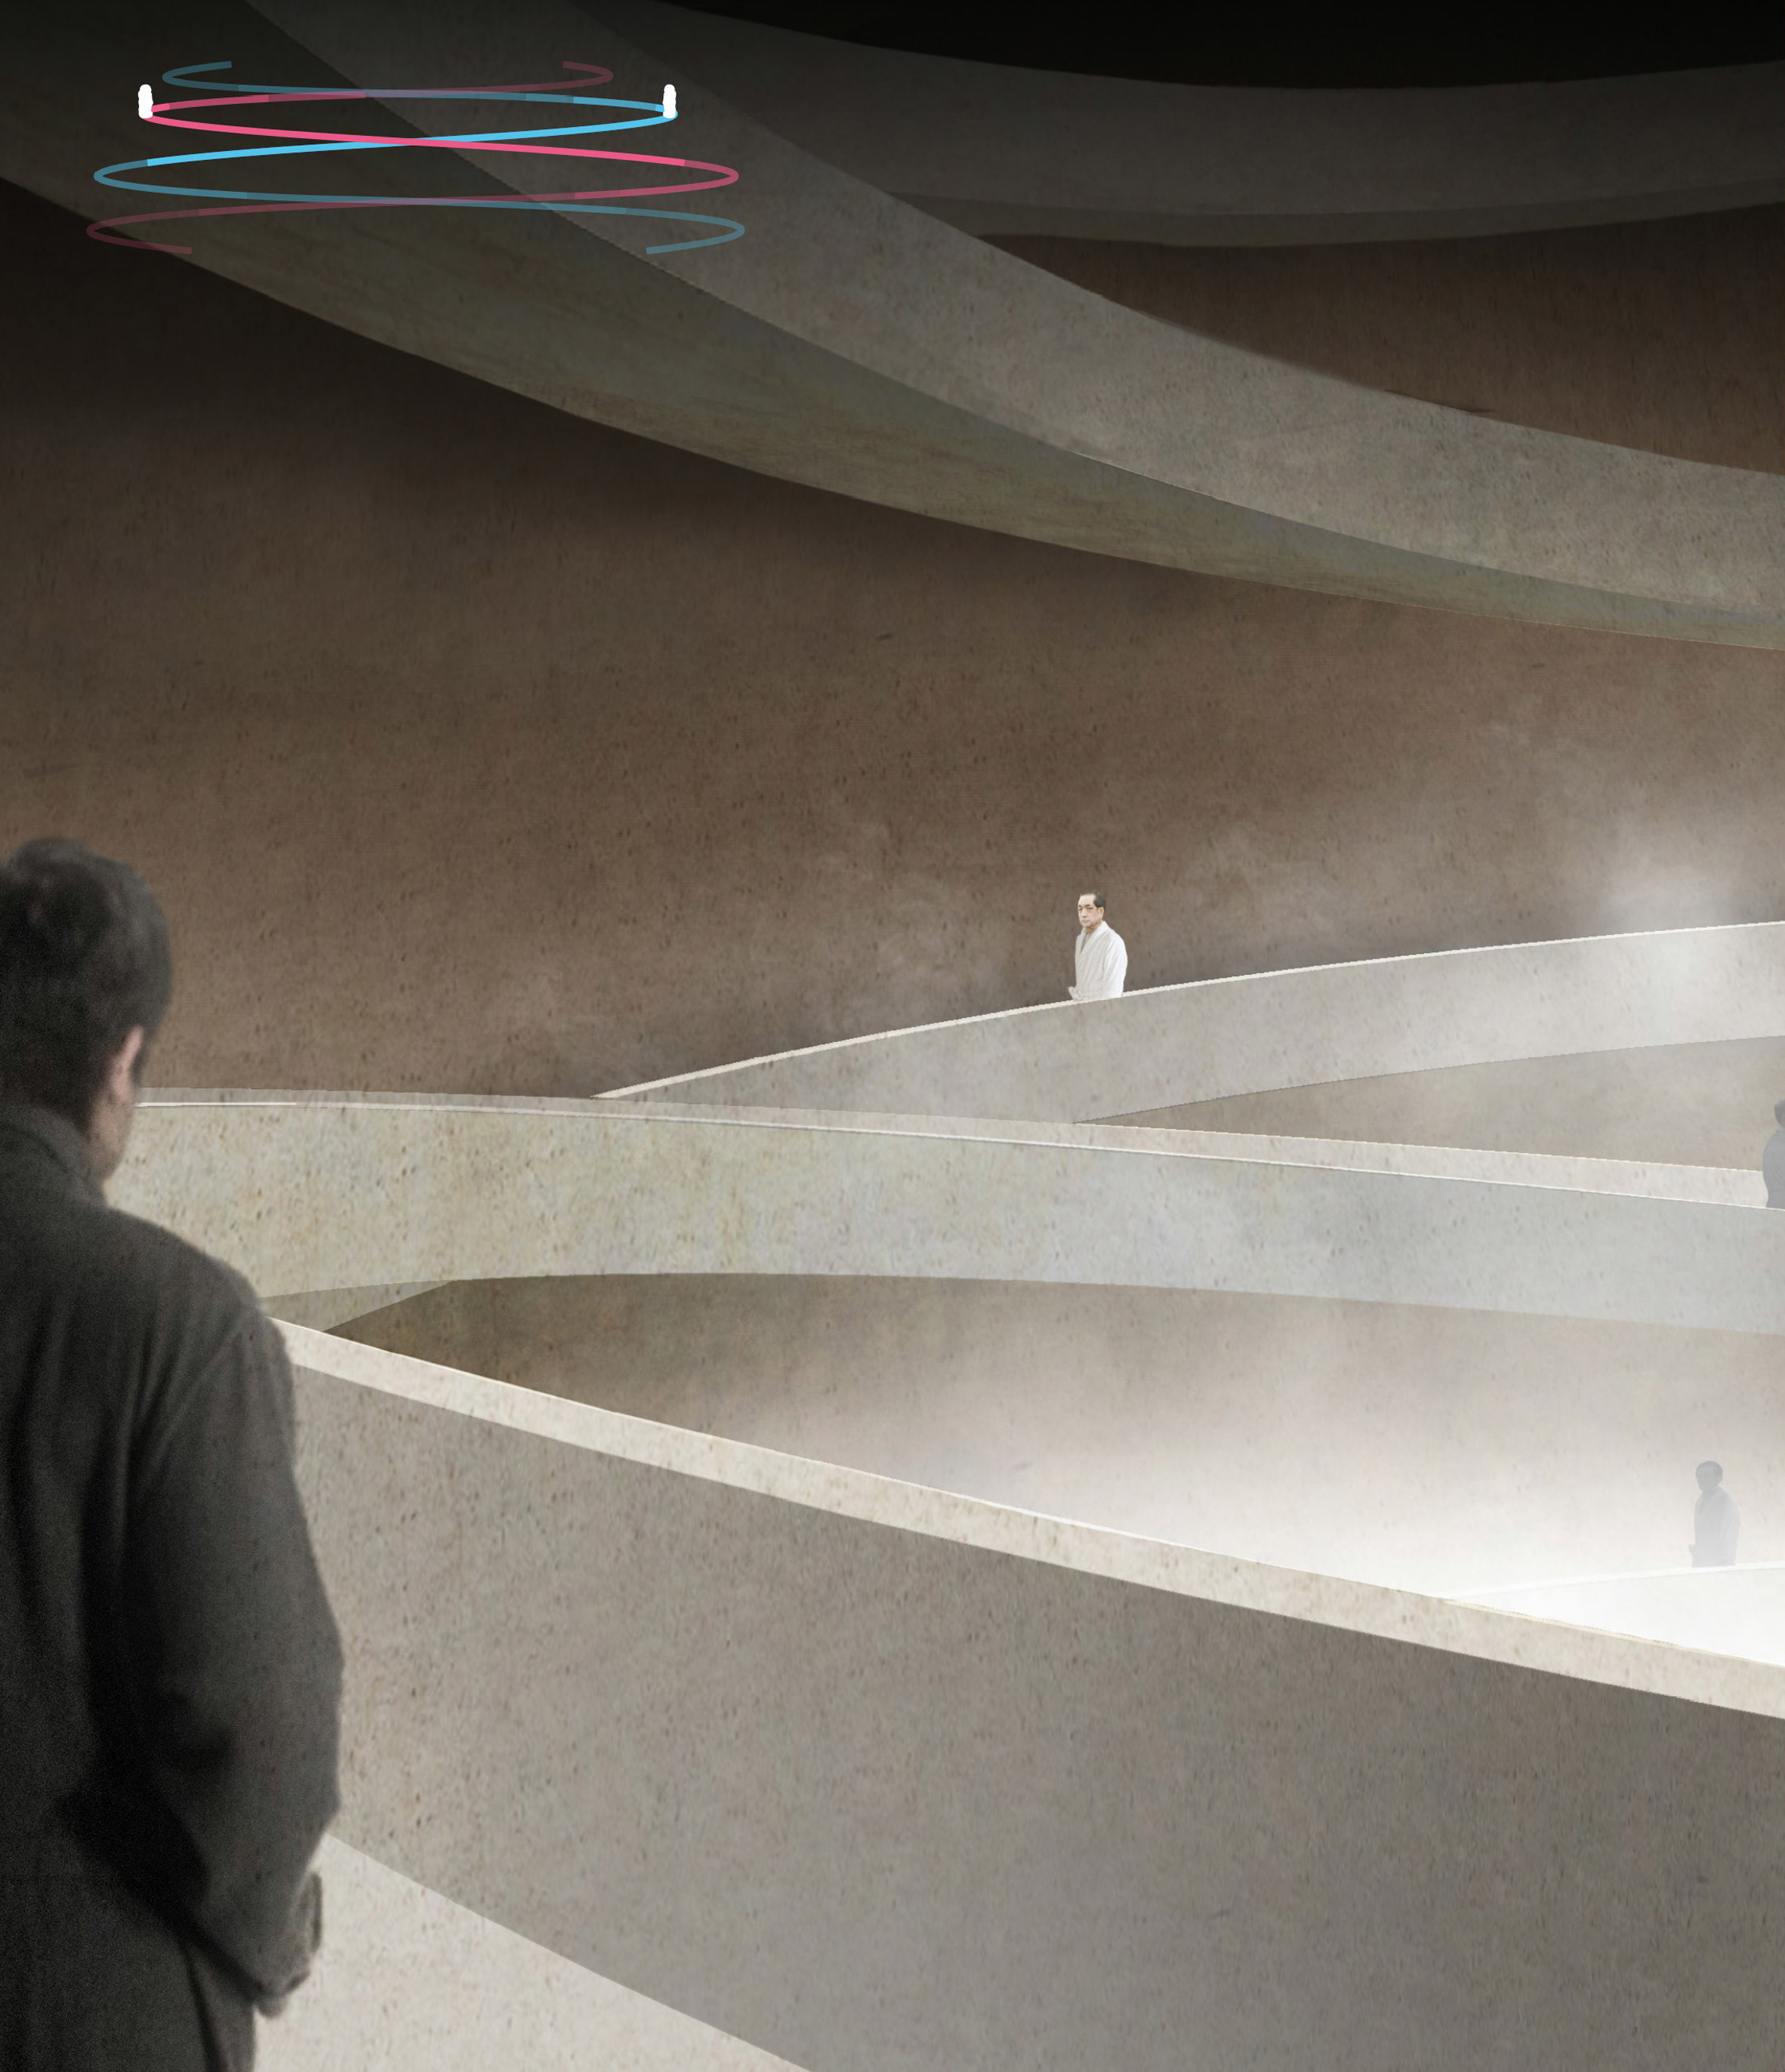 Studio MRDO and Studio LaM win Korean bathhouse contest with underground dome